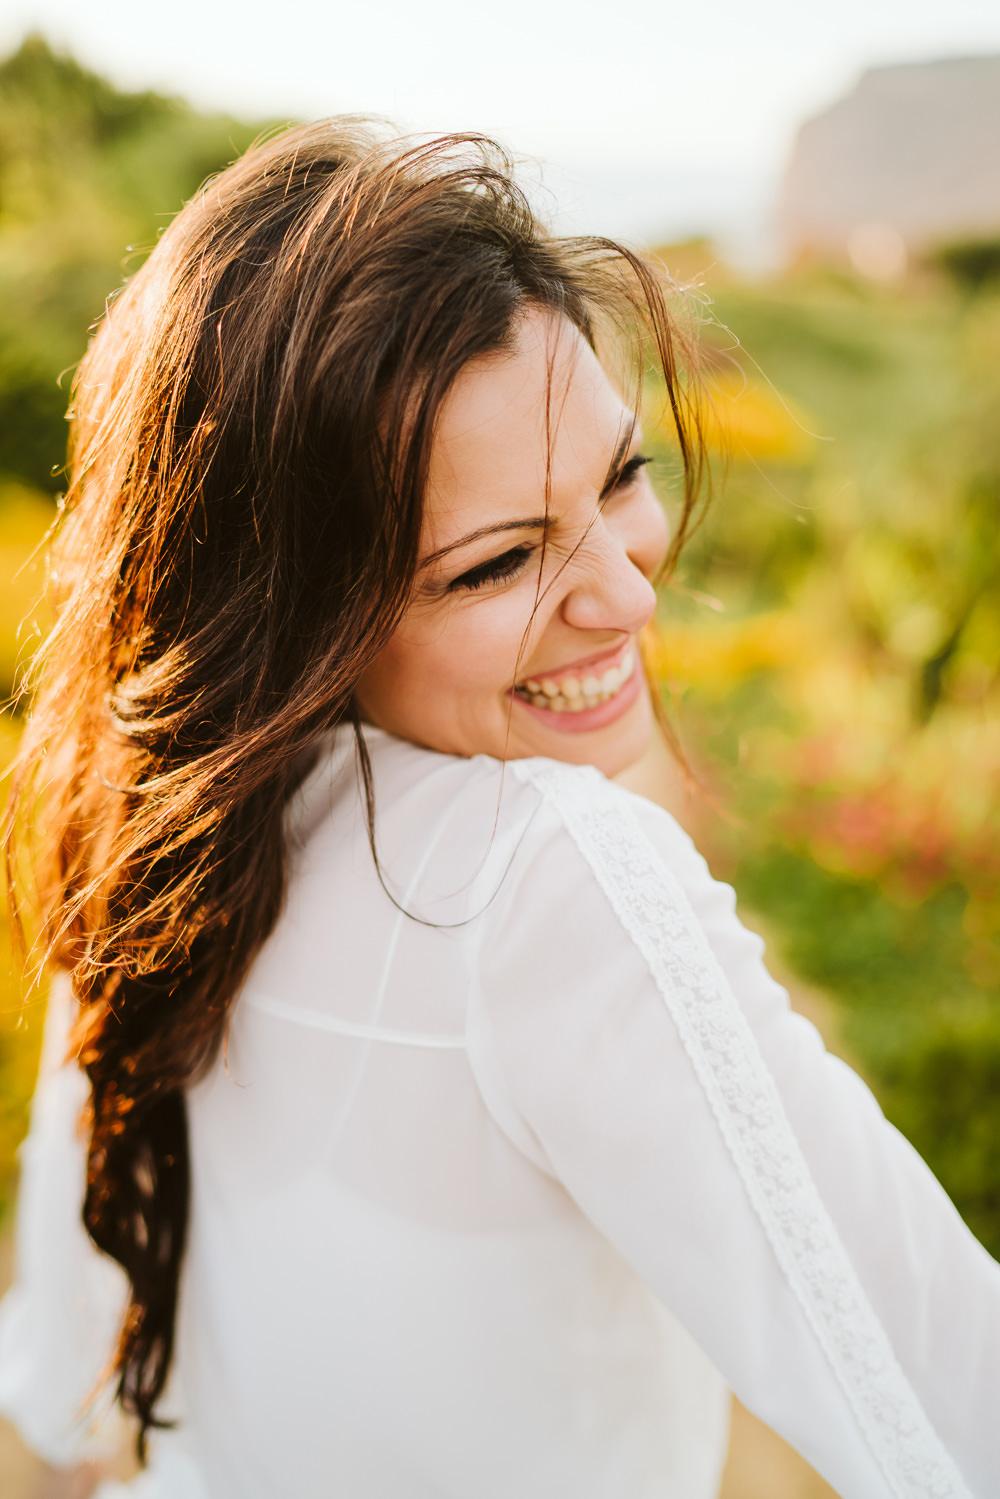 Hair Bride Bridal Style Clifftop Portugal Wedding Ideas John Barwood Photography